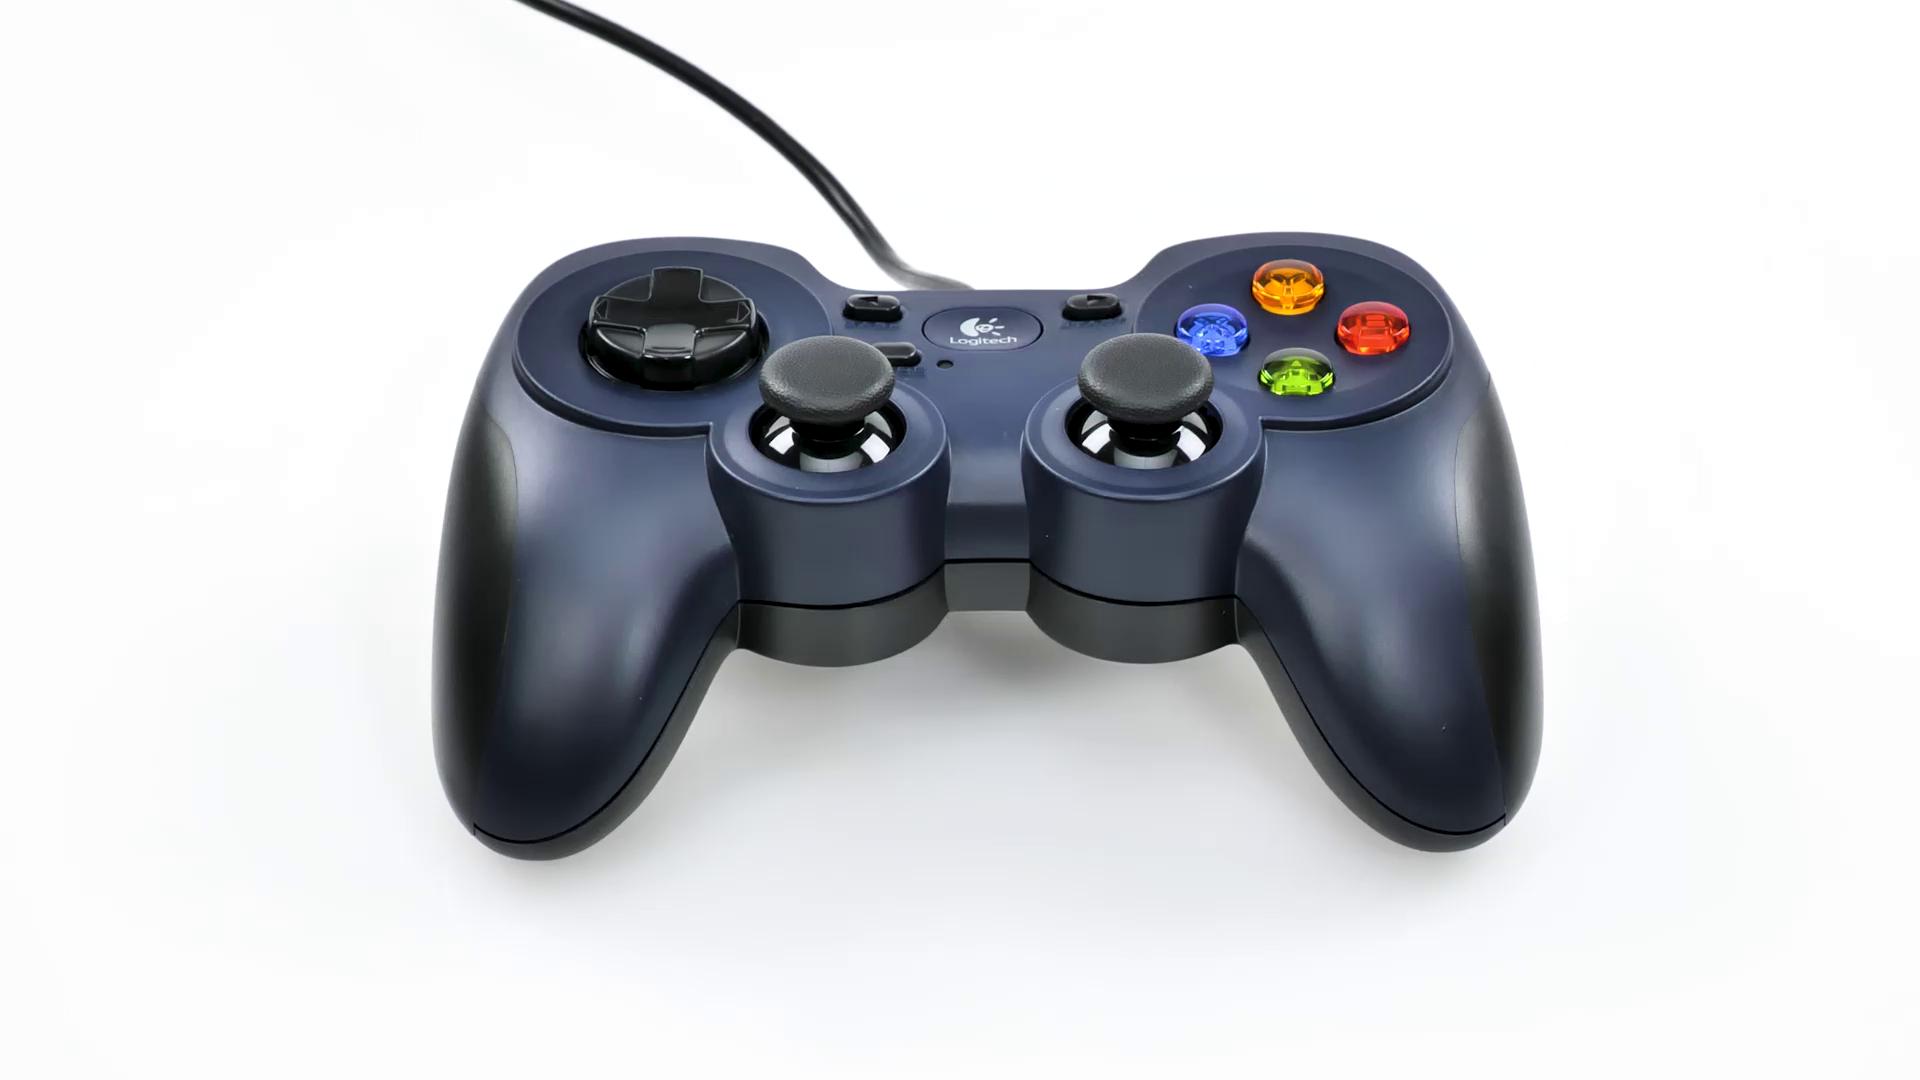 Logitech F310 Gamepad con Cable, Distribución Tipo Consola, Mando de Dirección 4 Conmutadores, Comodidad de Sujeción, Cable 1,8m, PC/Steam/AndroidTV , Azul/Gris: Logitech: Amazon.es: Informática